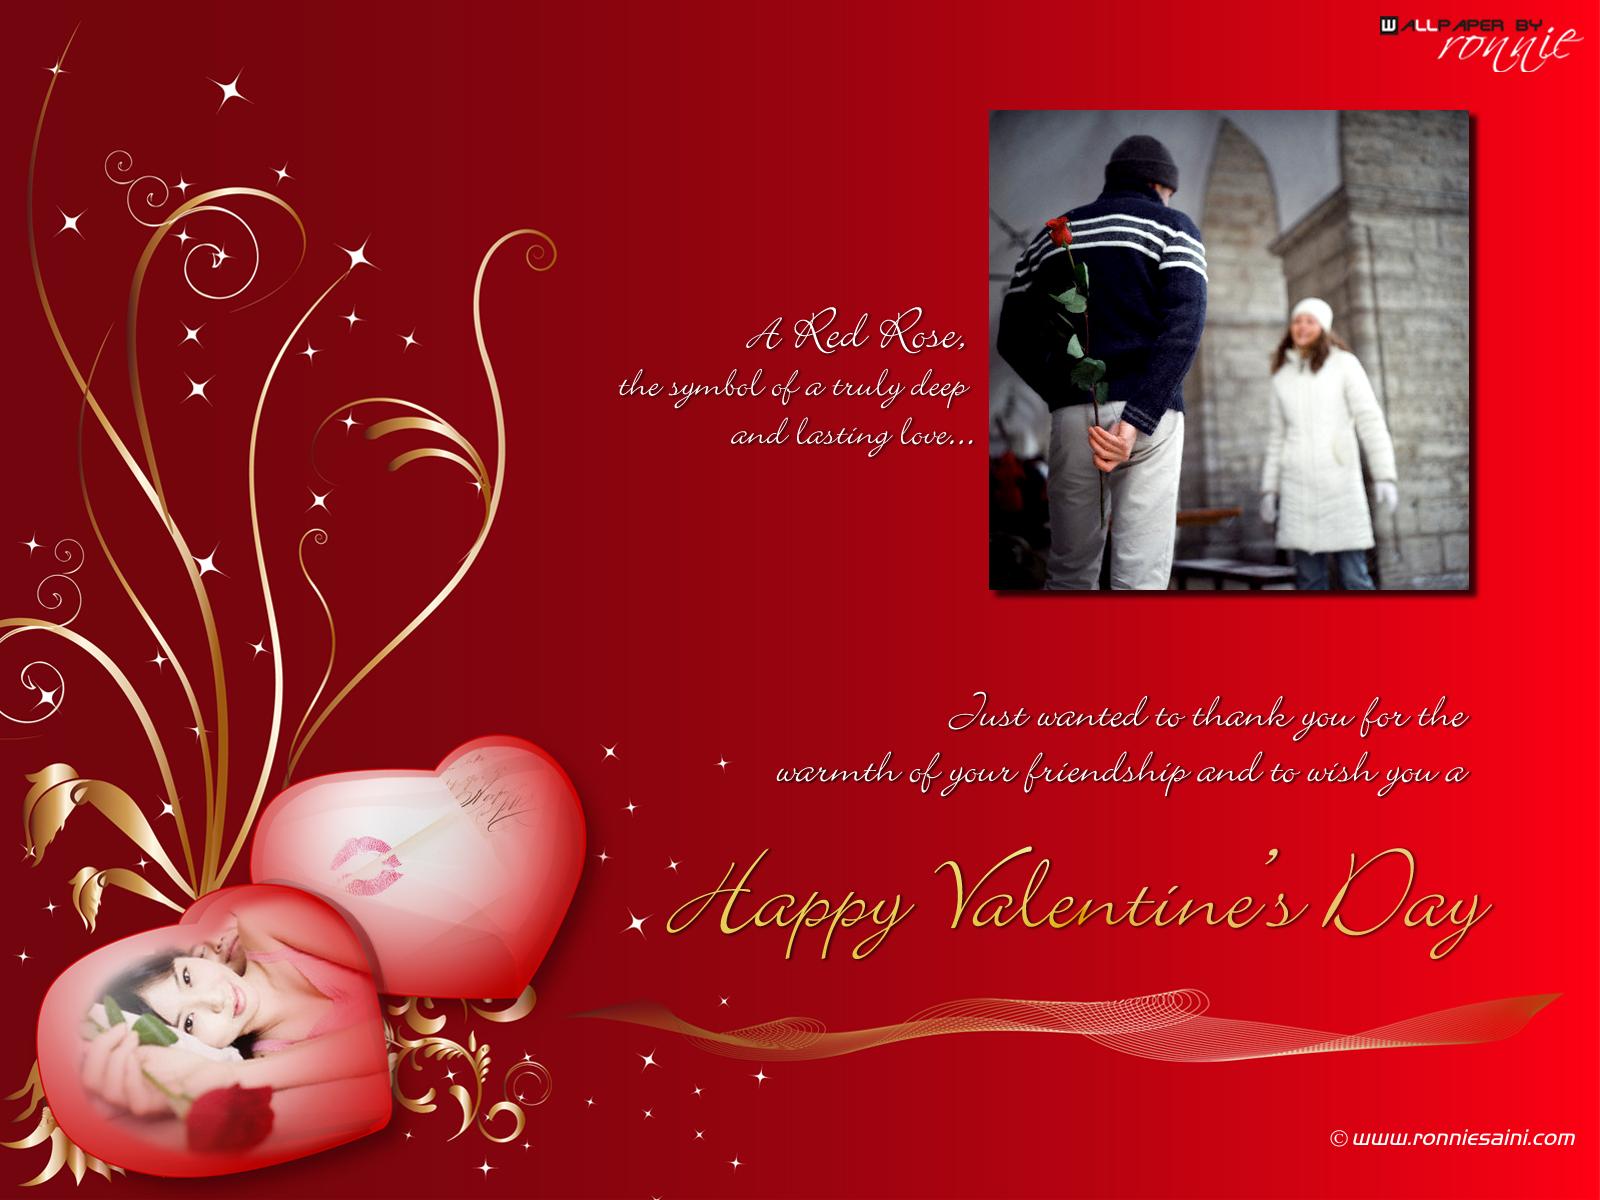 Valentines Day Wallpaper 1600x1200